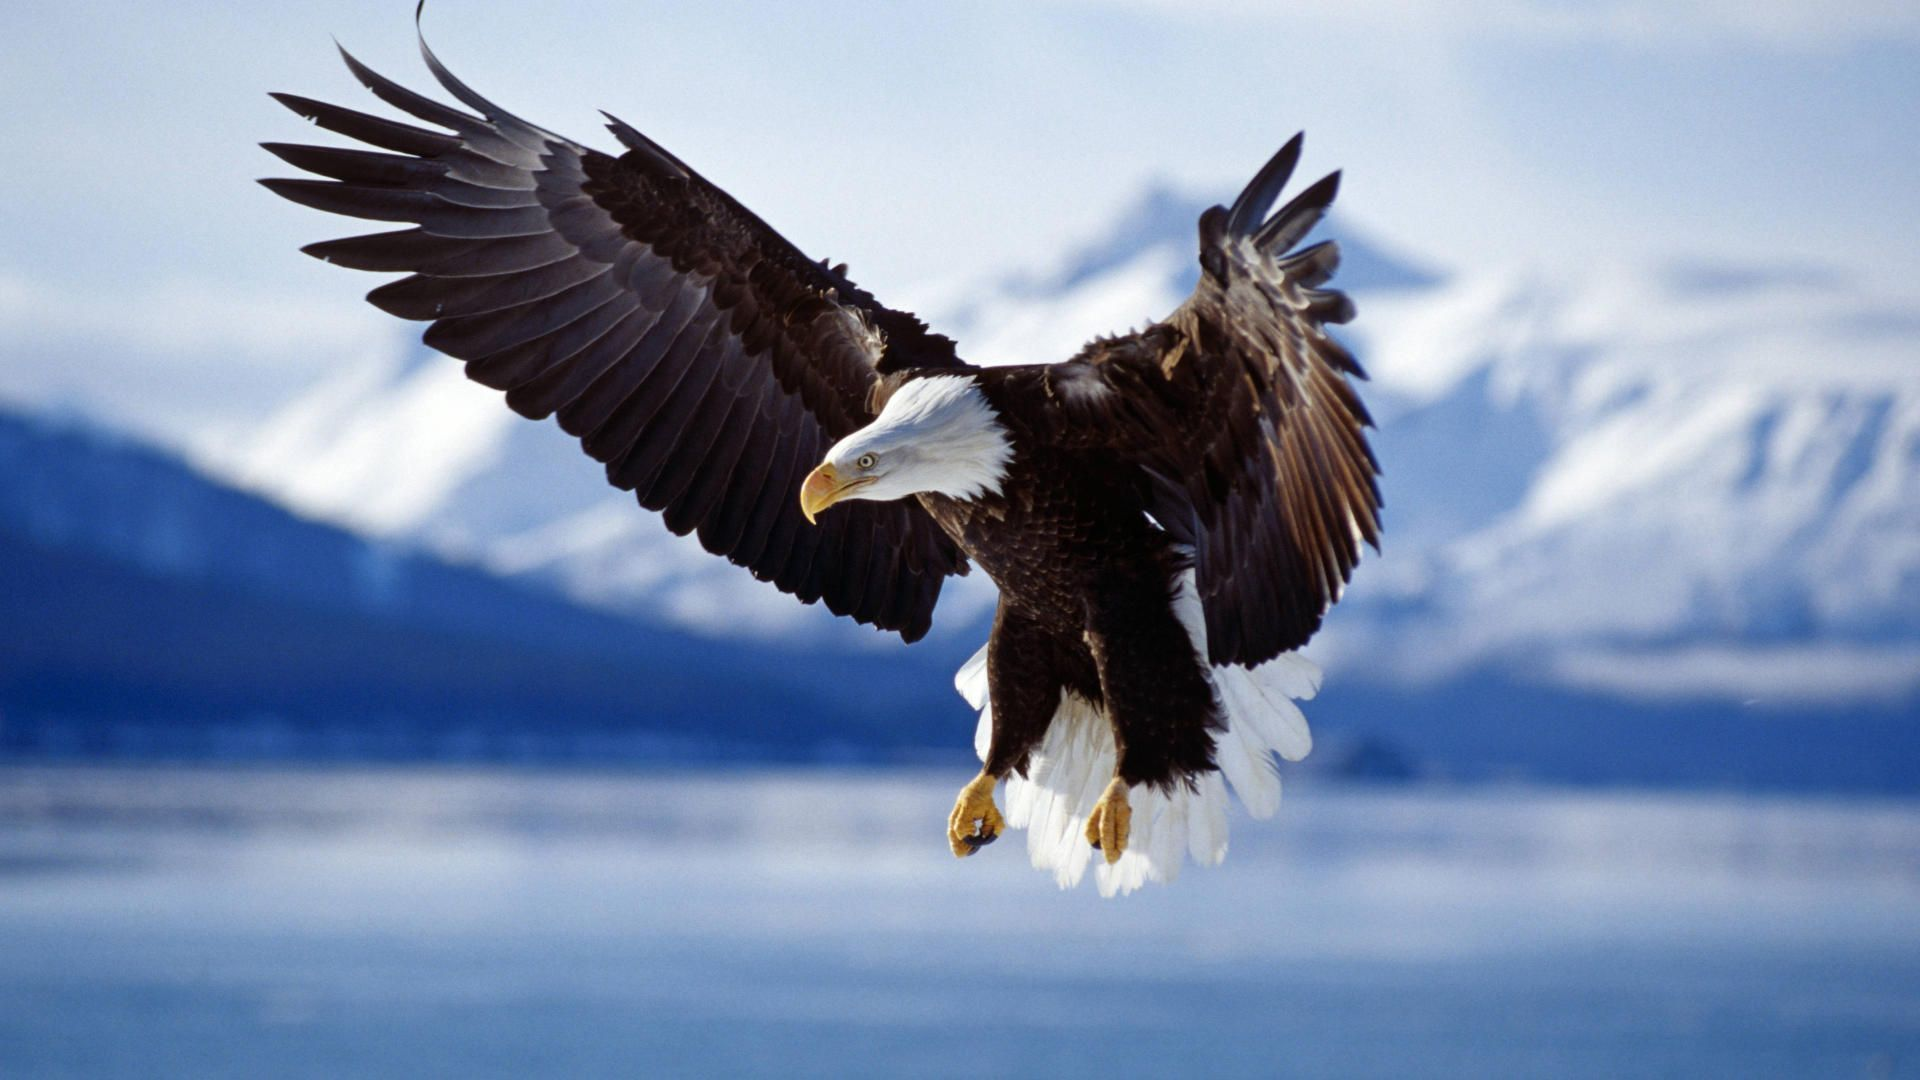 Eagle nature hd wallpaperbird   plingcom 1920x1080